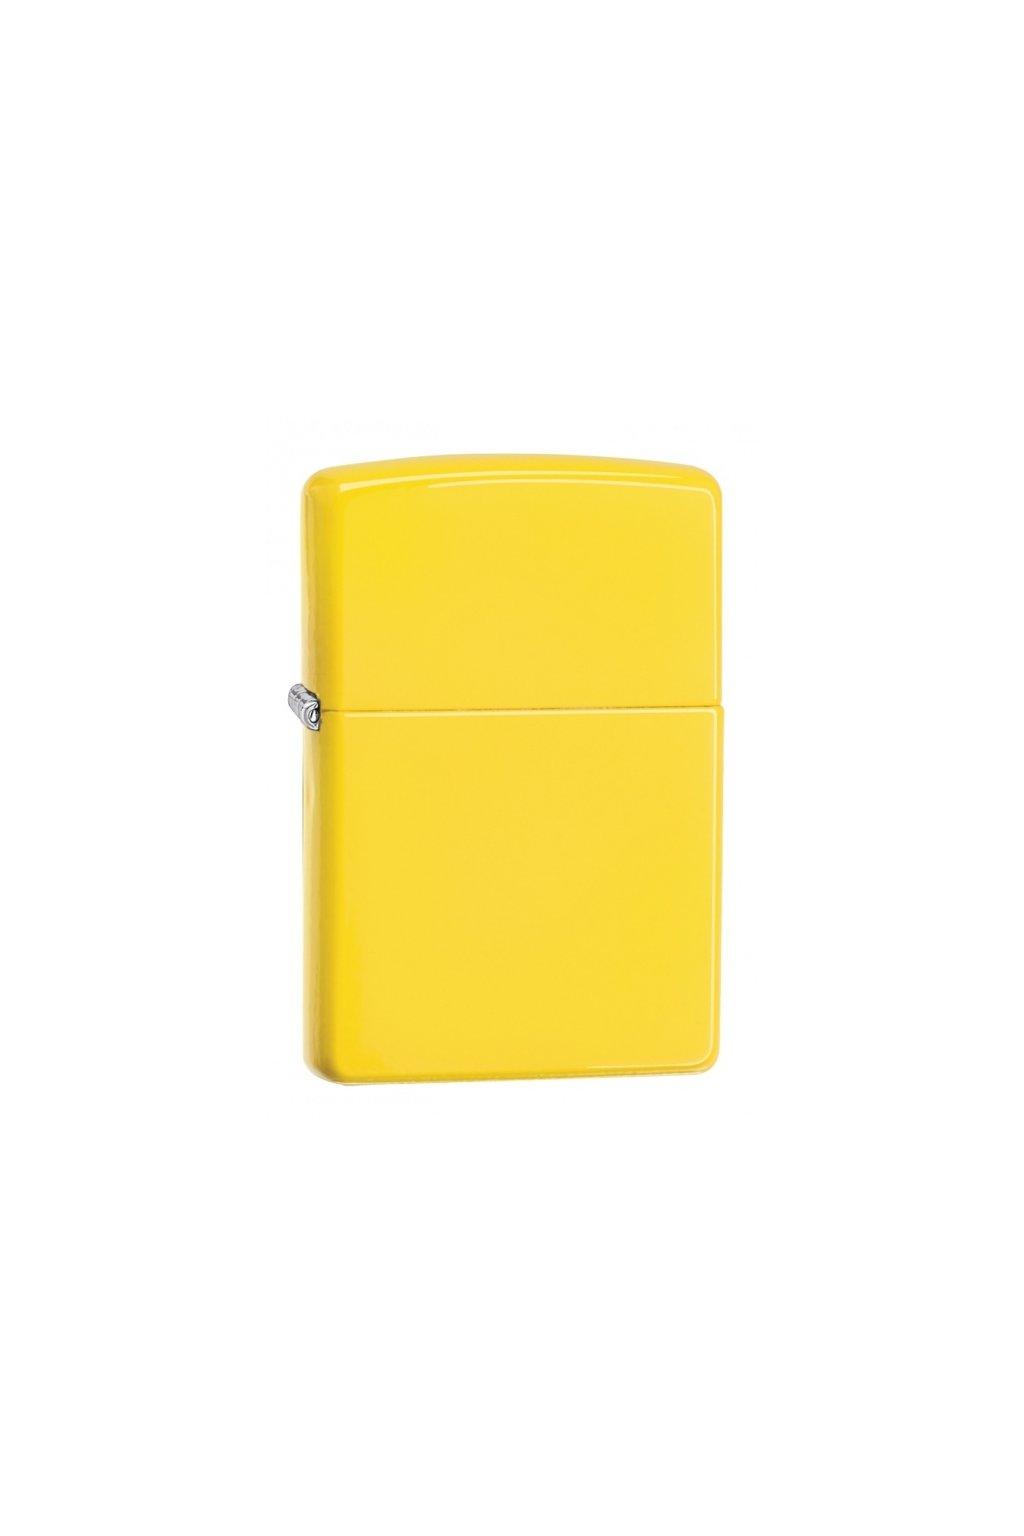 93770 zippo zapalovac 26370 lemon